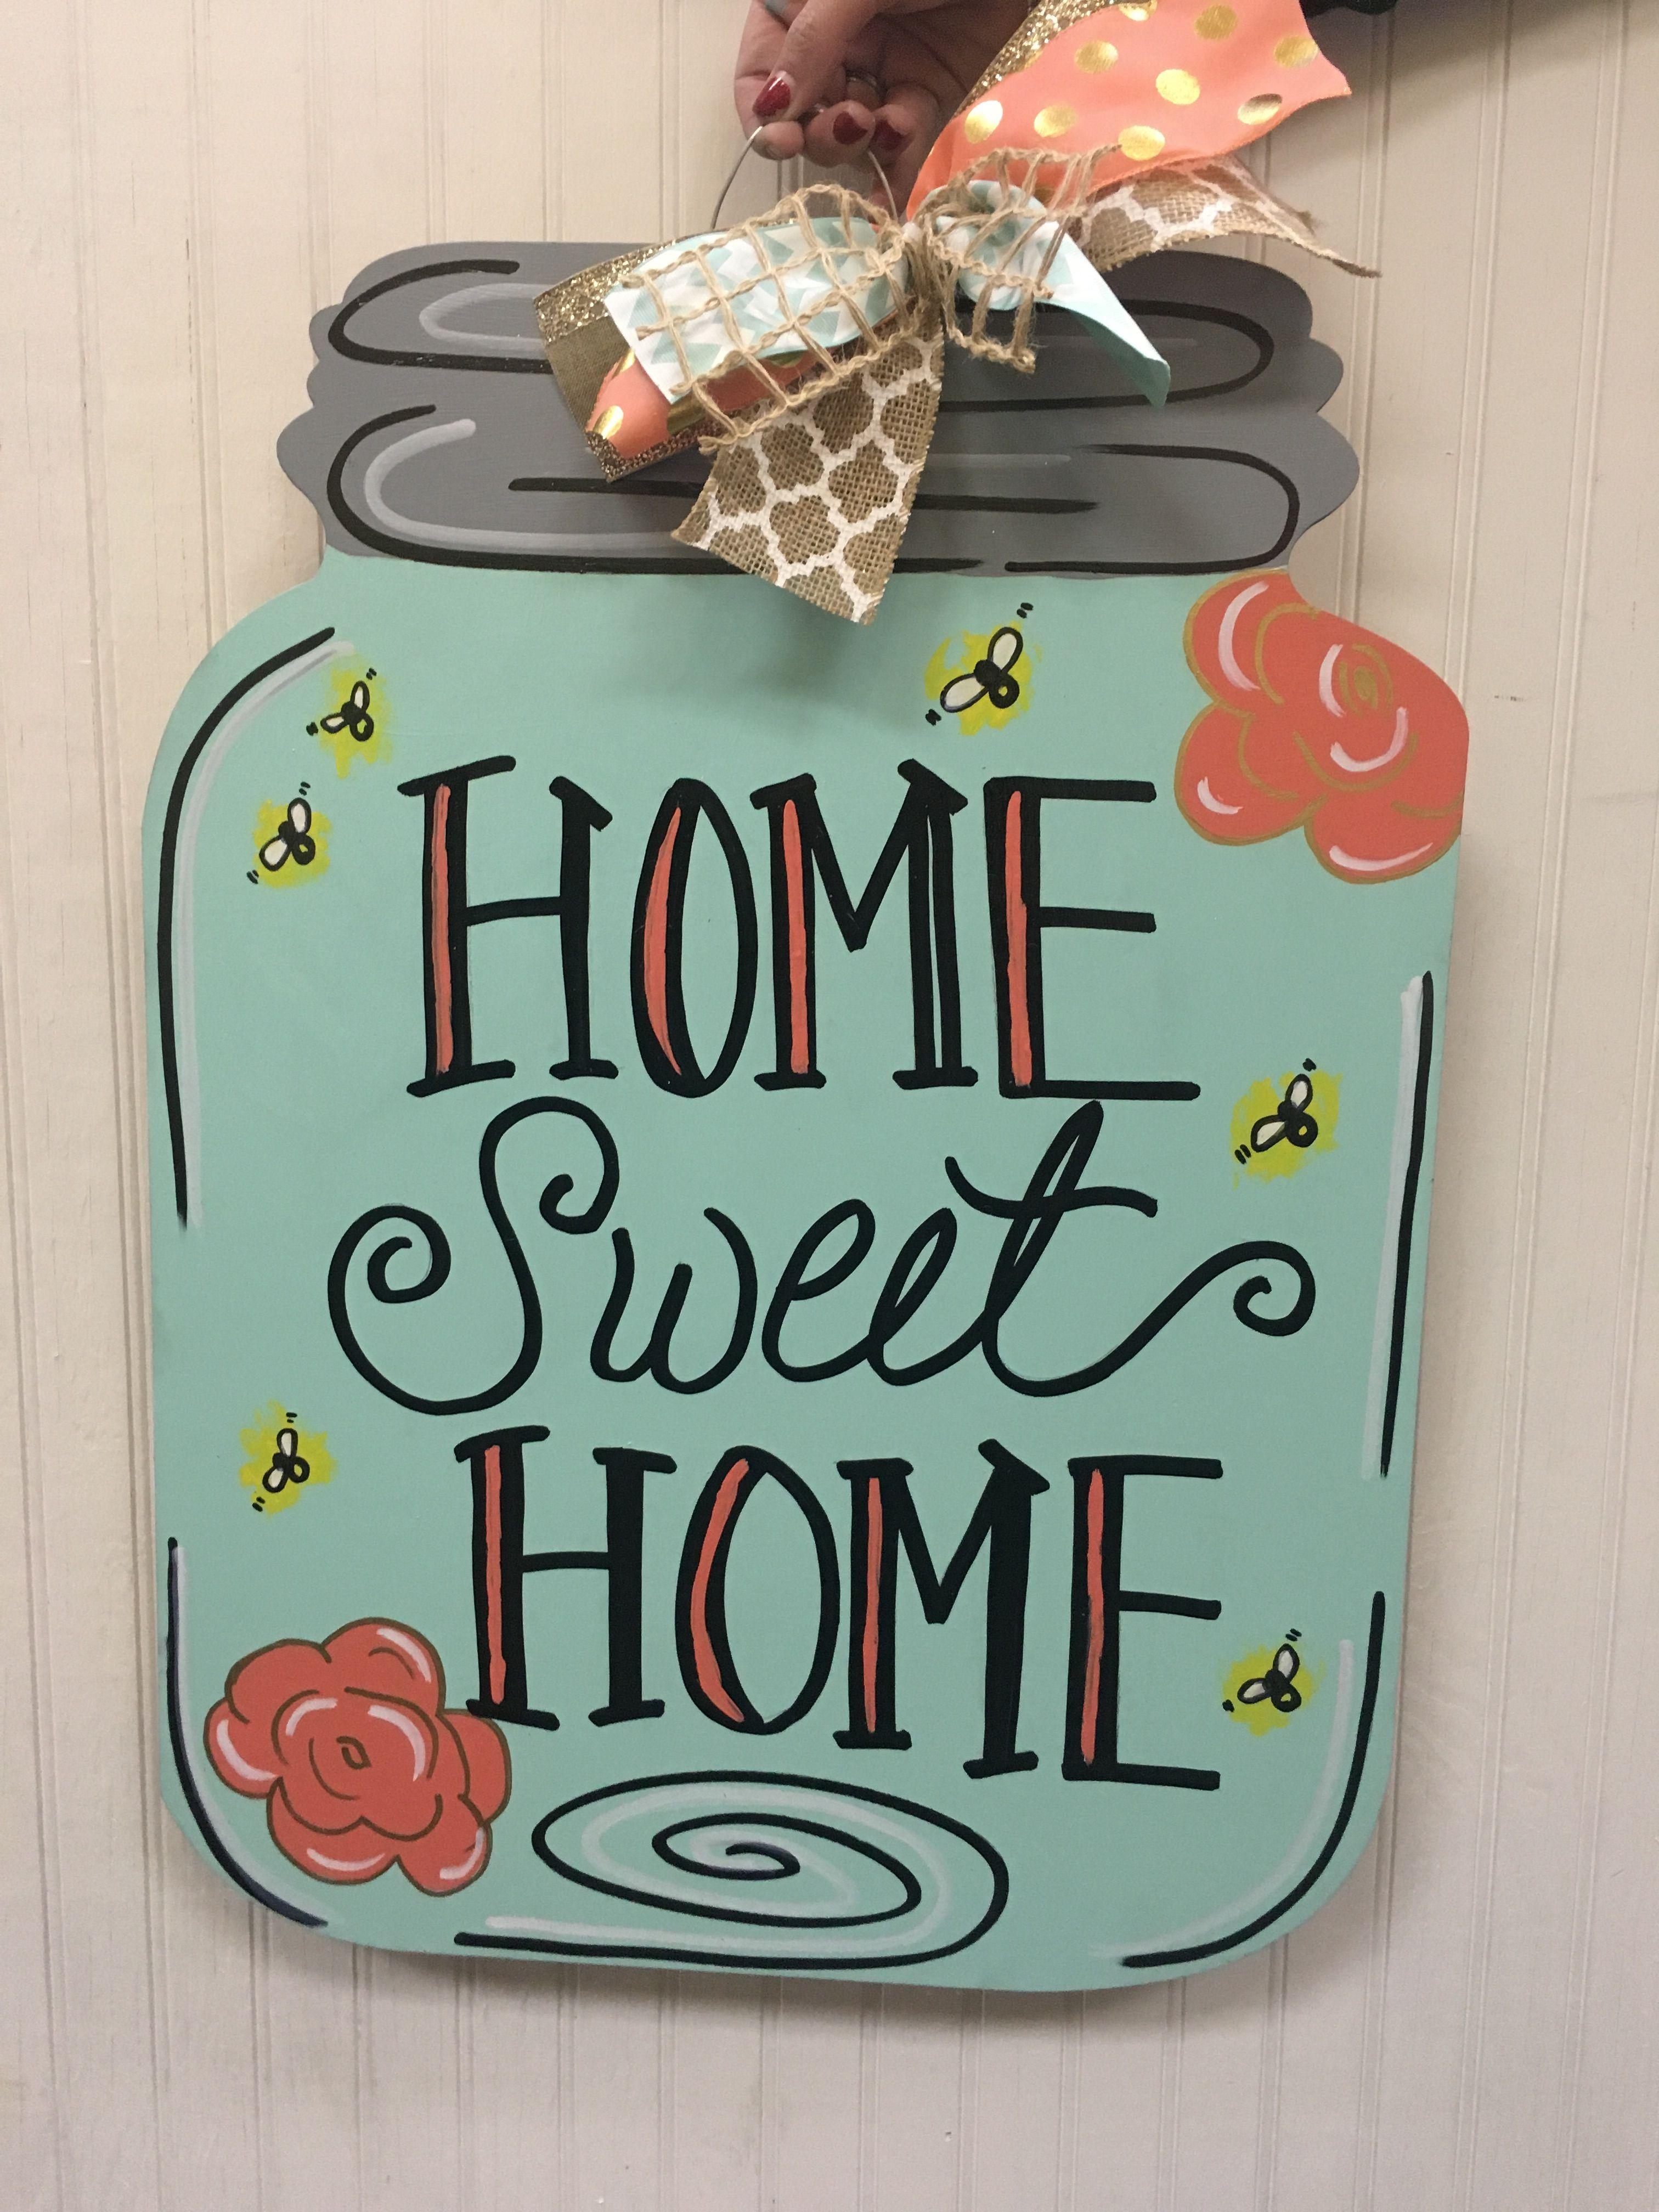 Home Sweet Home Mason Jar Door Hanger Craft Night Out Statesville Nc Doorsigns Mason Jar Door Hanger Door Hangers Diy Summer Door Hanger